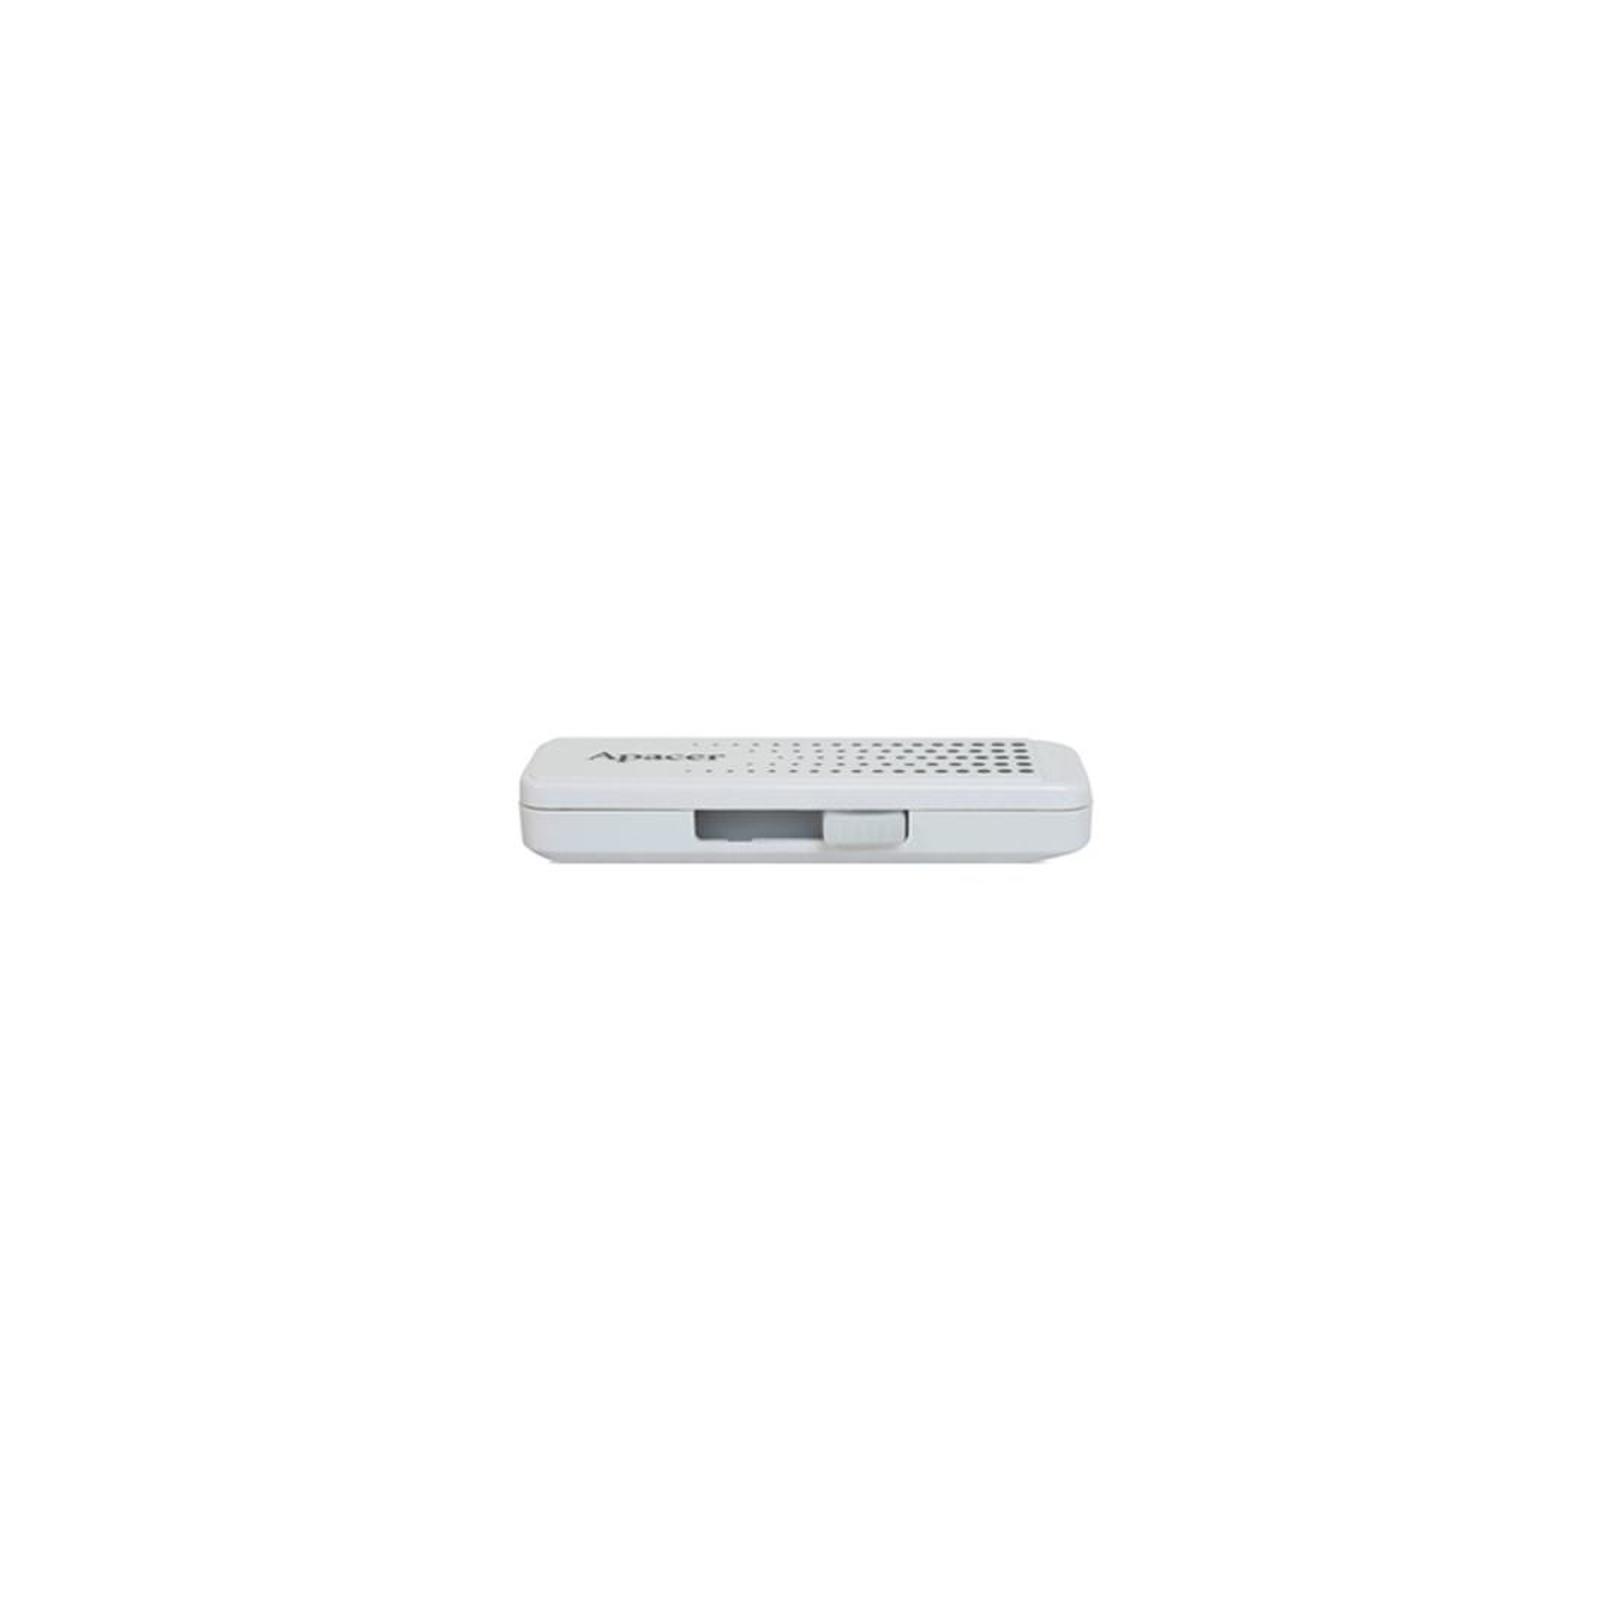 USB флеш накопитель Handy Steno AH323 white Apacer (AP8GAH323W-1) изображение 3